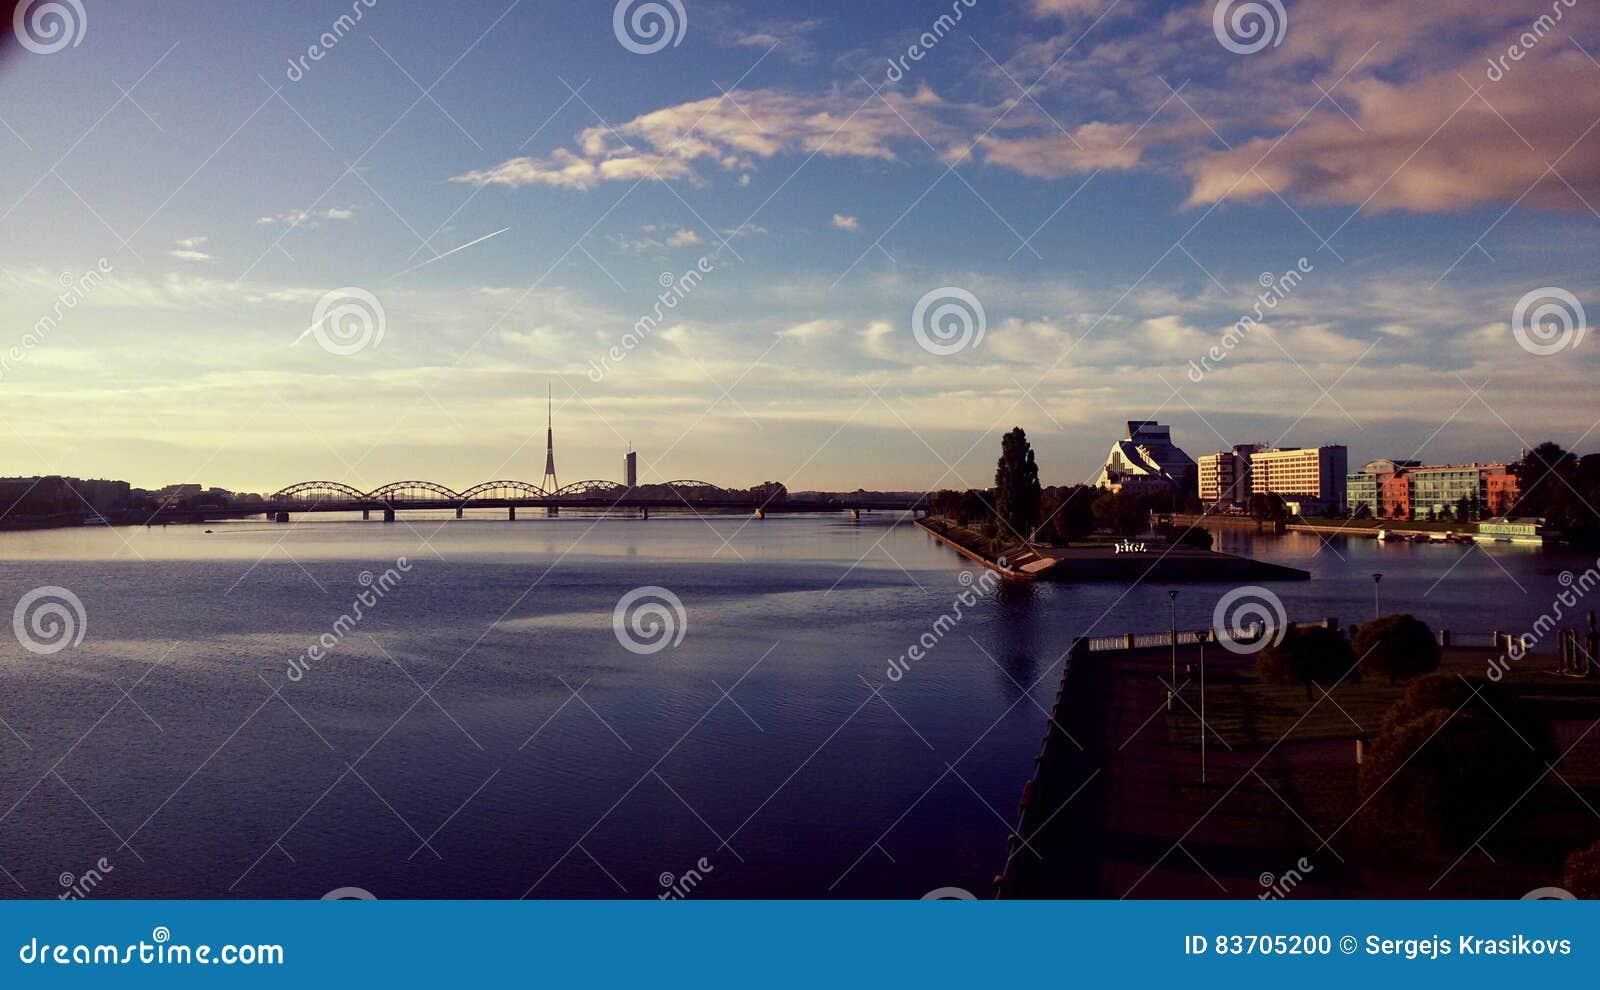 City Editorial Image